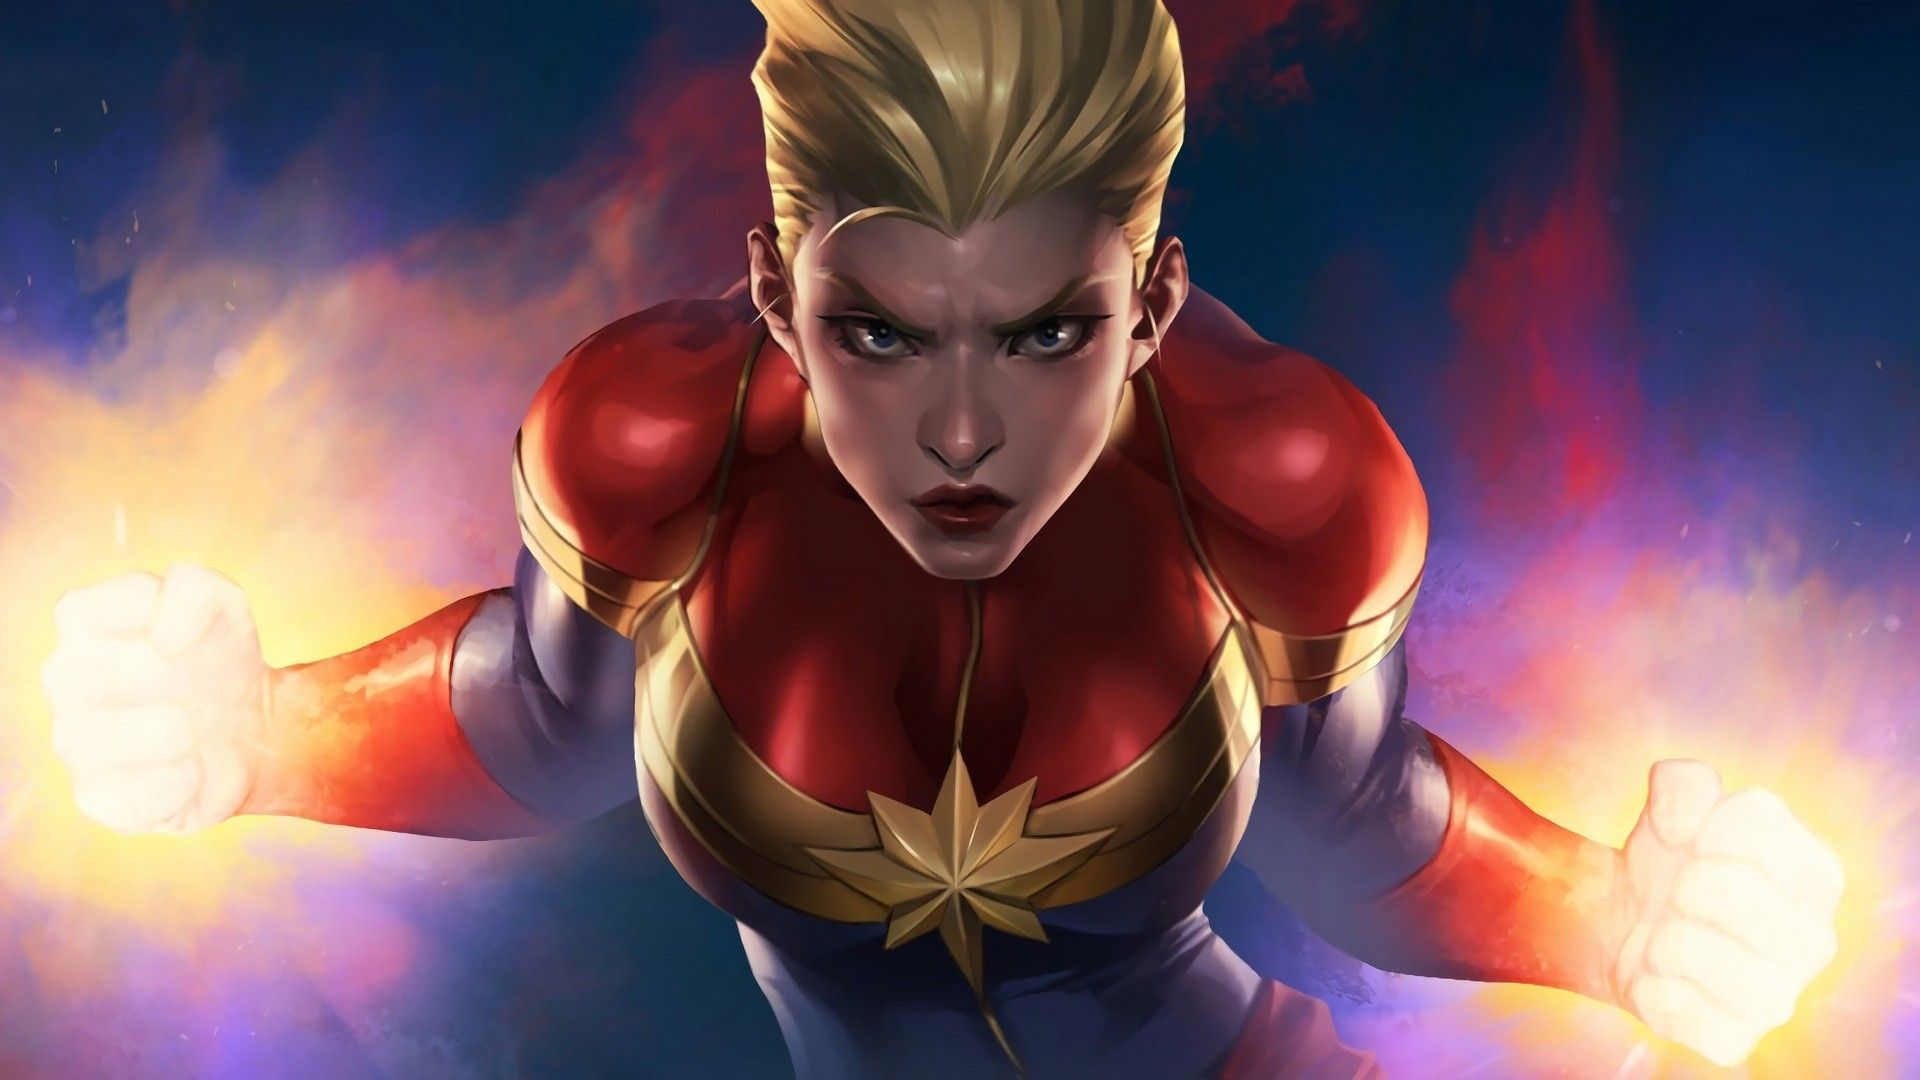 Best Captain Marvel Animated Wallpaper Hd 2021 Live Wallpaper Hd Marvel Animation Captain Marvel Marvel Wallpaper